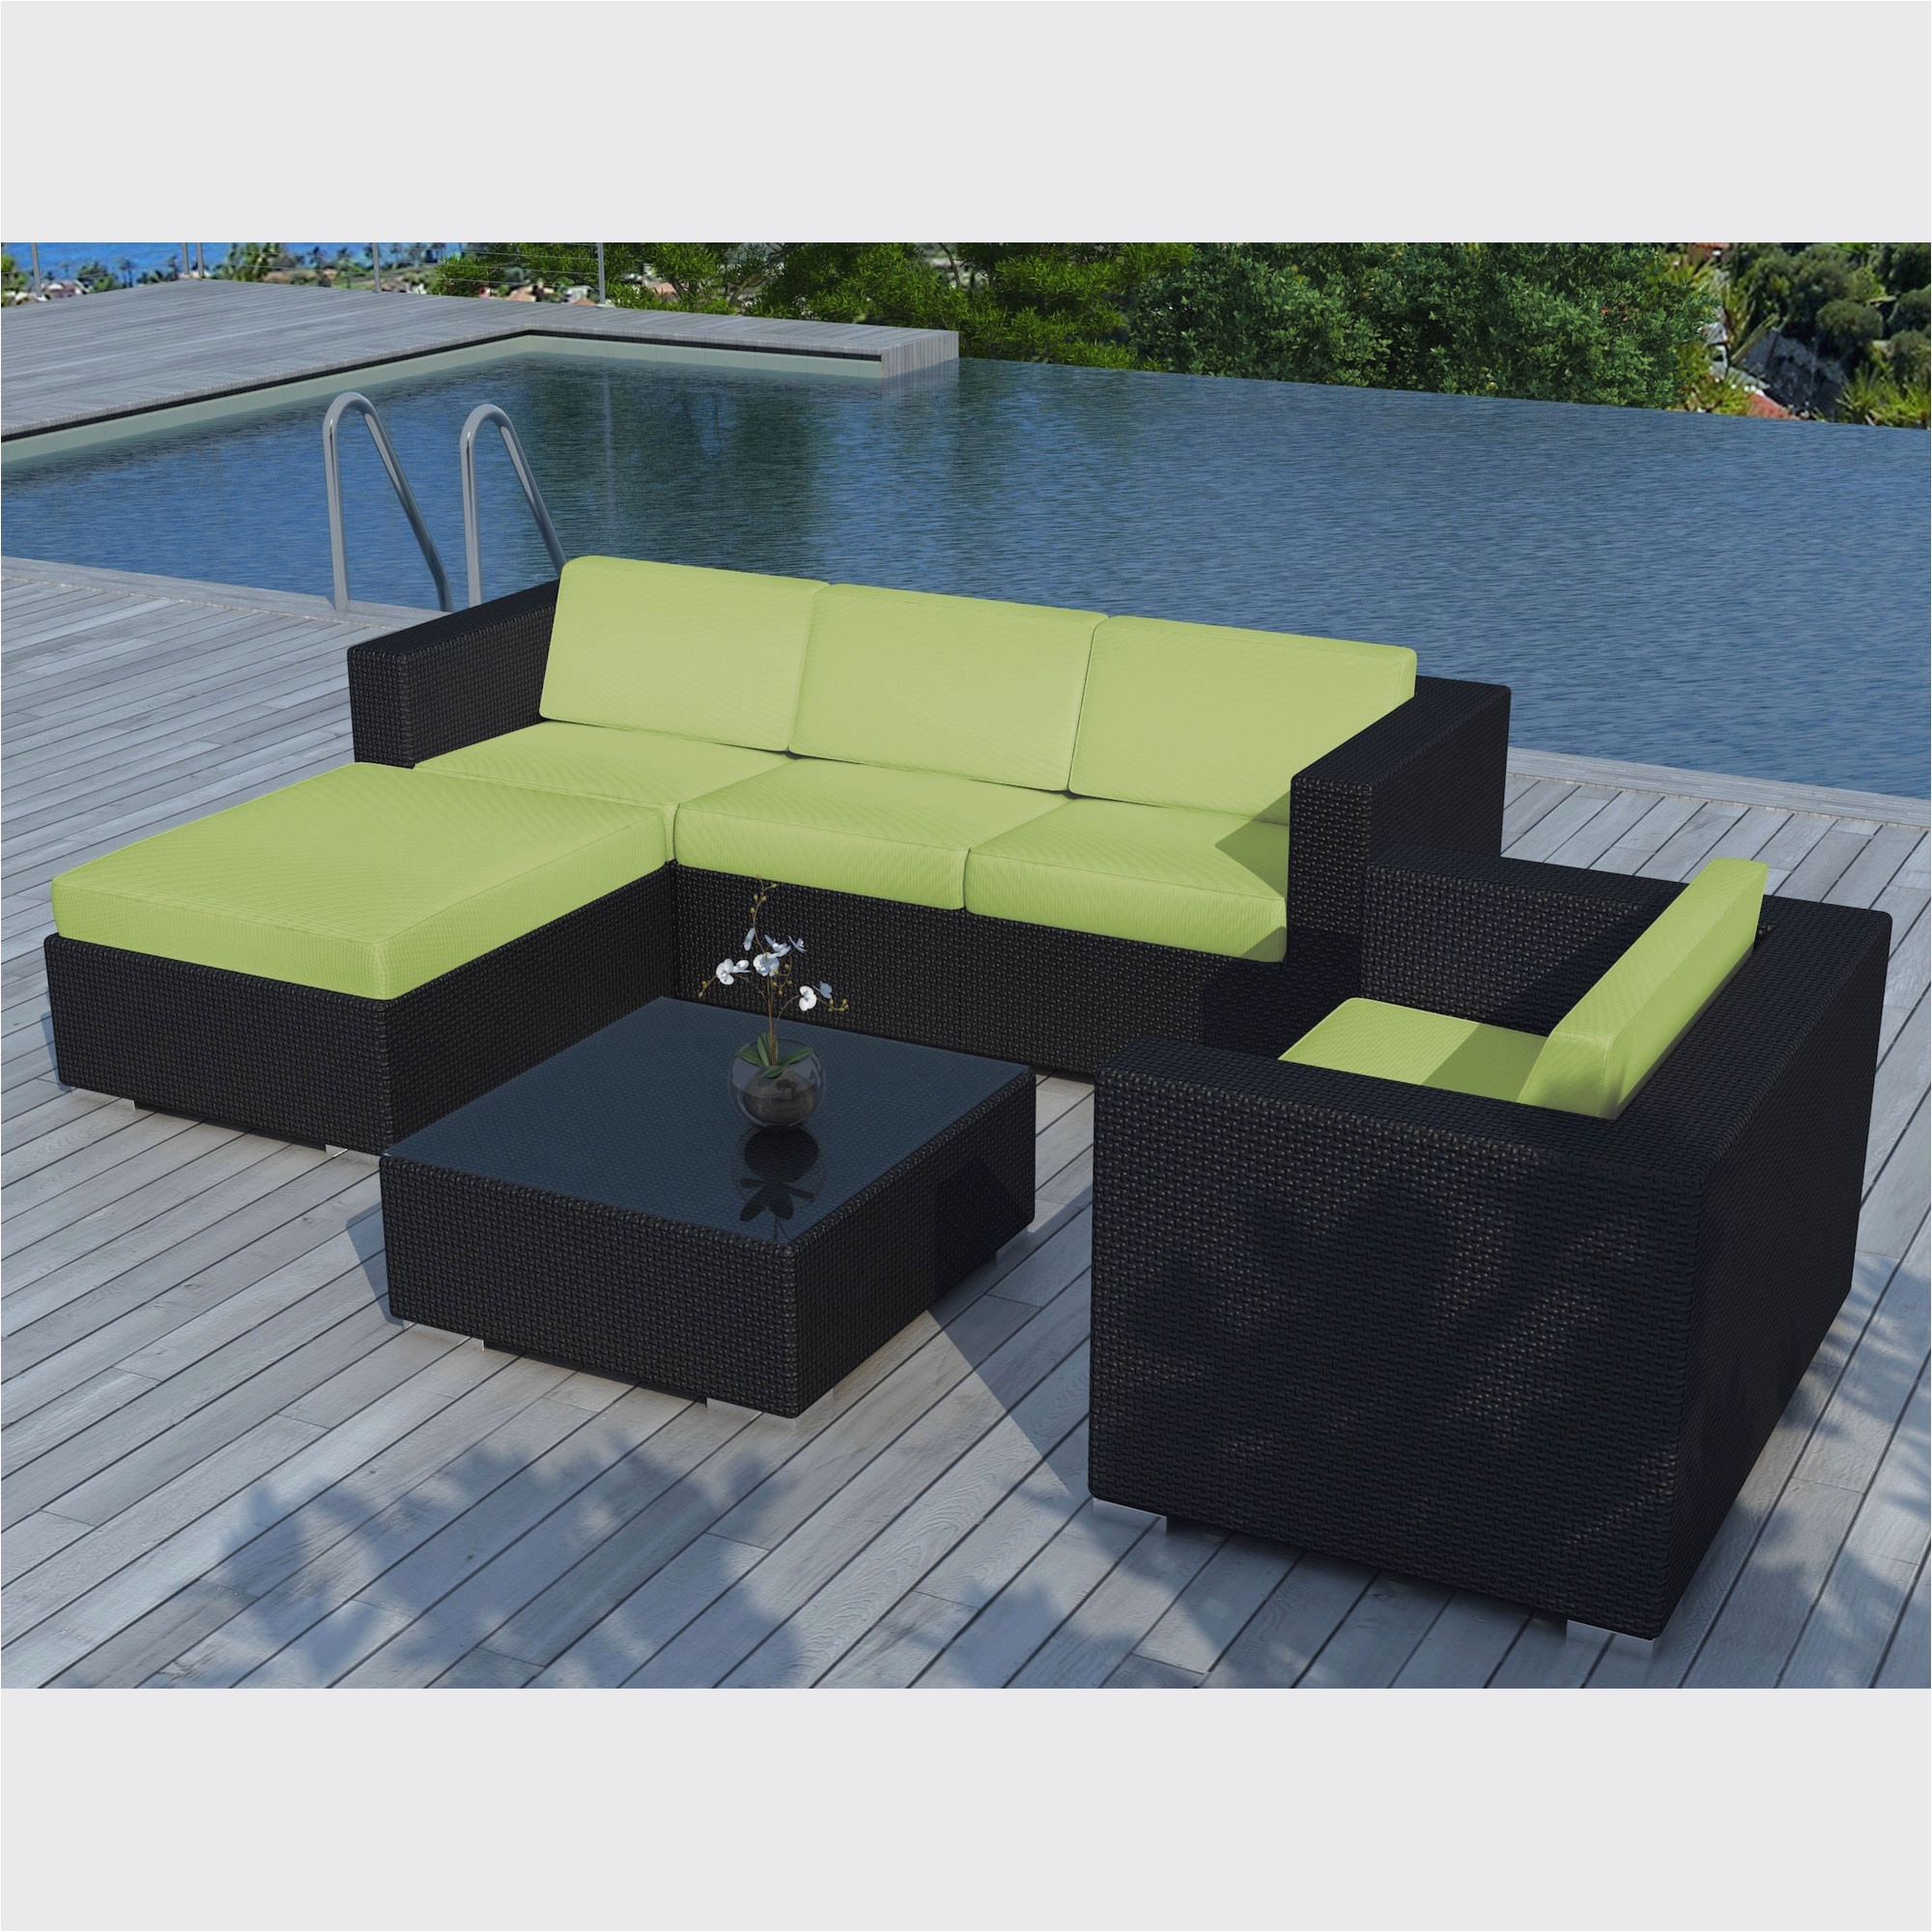 mini serre de jardin leclerc unique collection gallery of. Black Bedroom Furniture Sets. Home Design Ideas